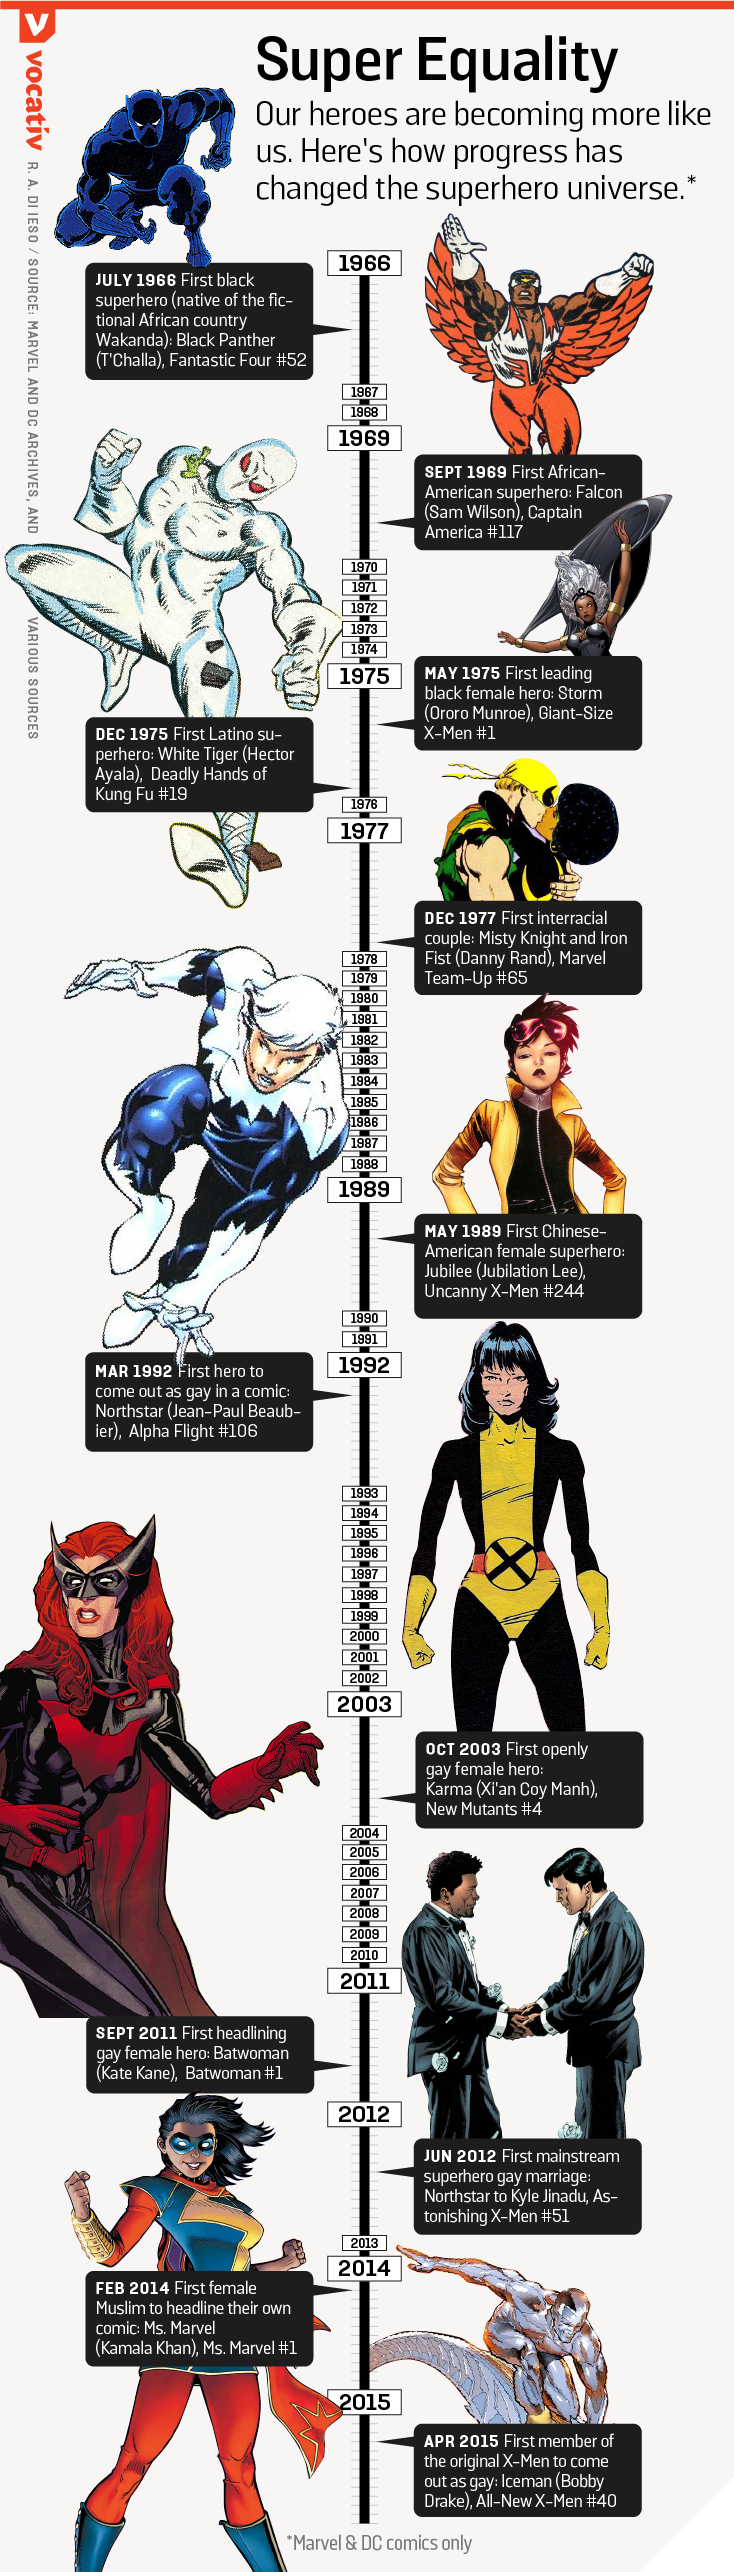 comic_book_history redone 10 3 2016.r2